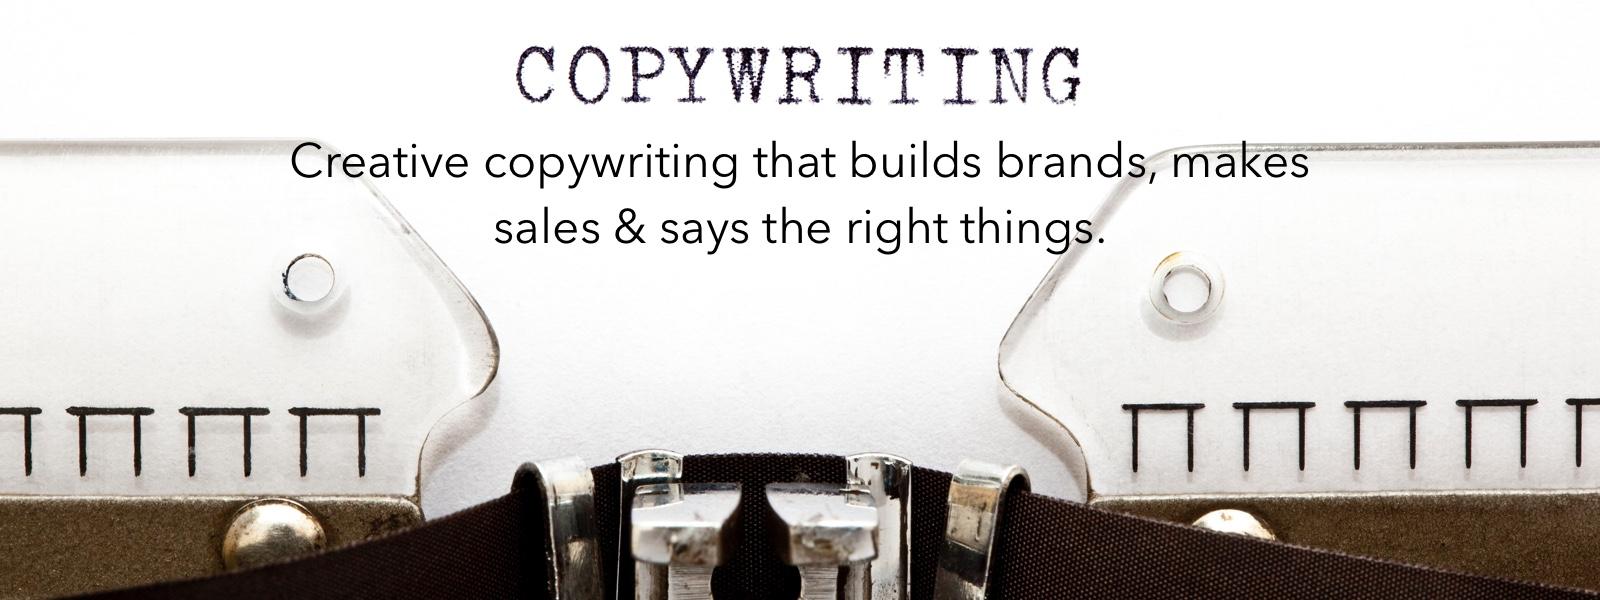 https://www.copydoctor.com.au/copywriting-services/